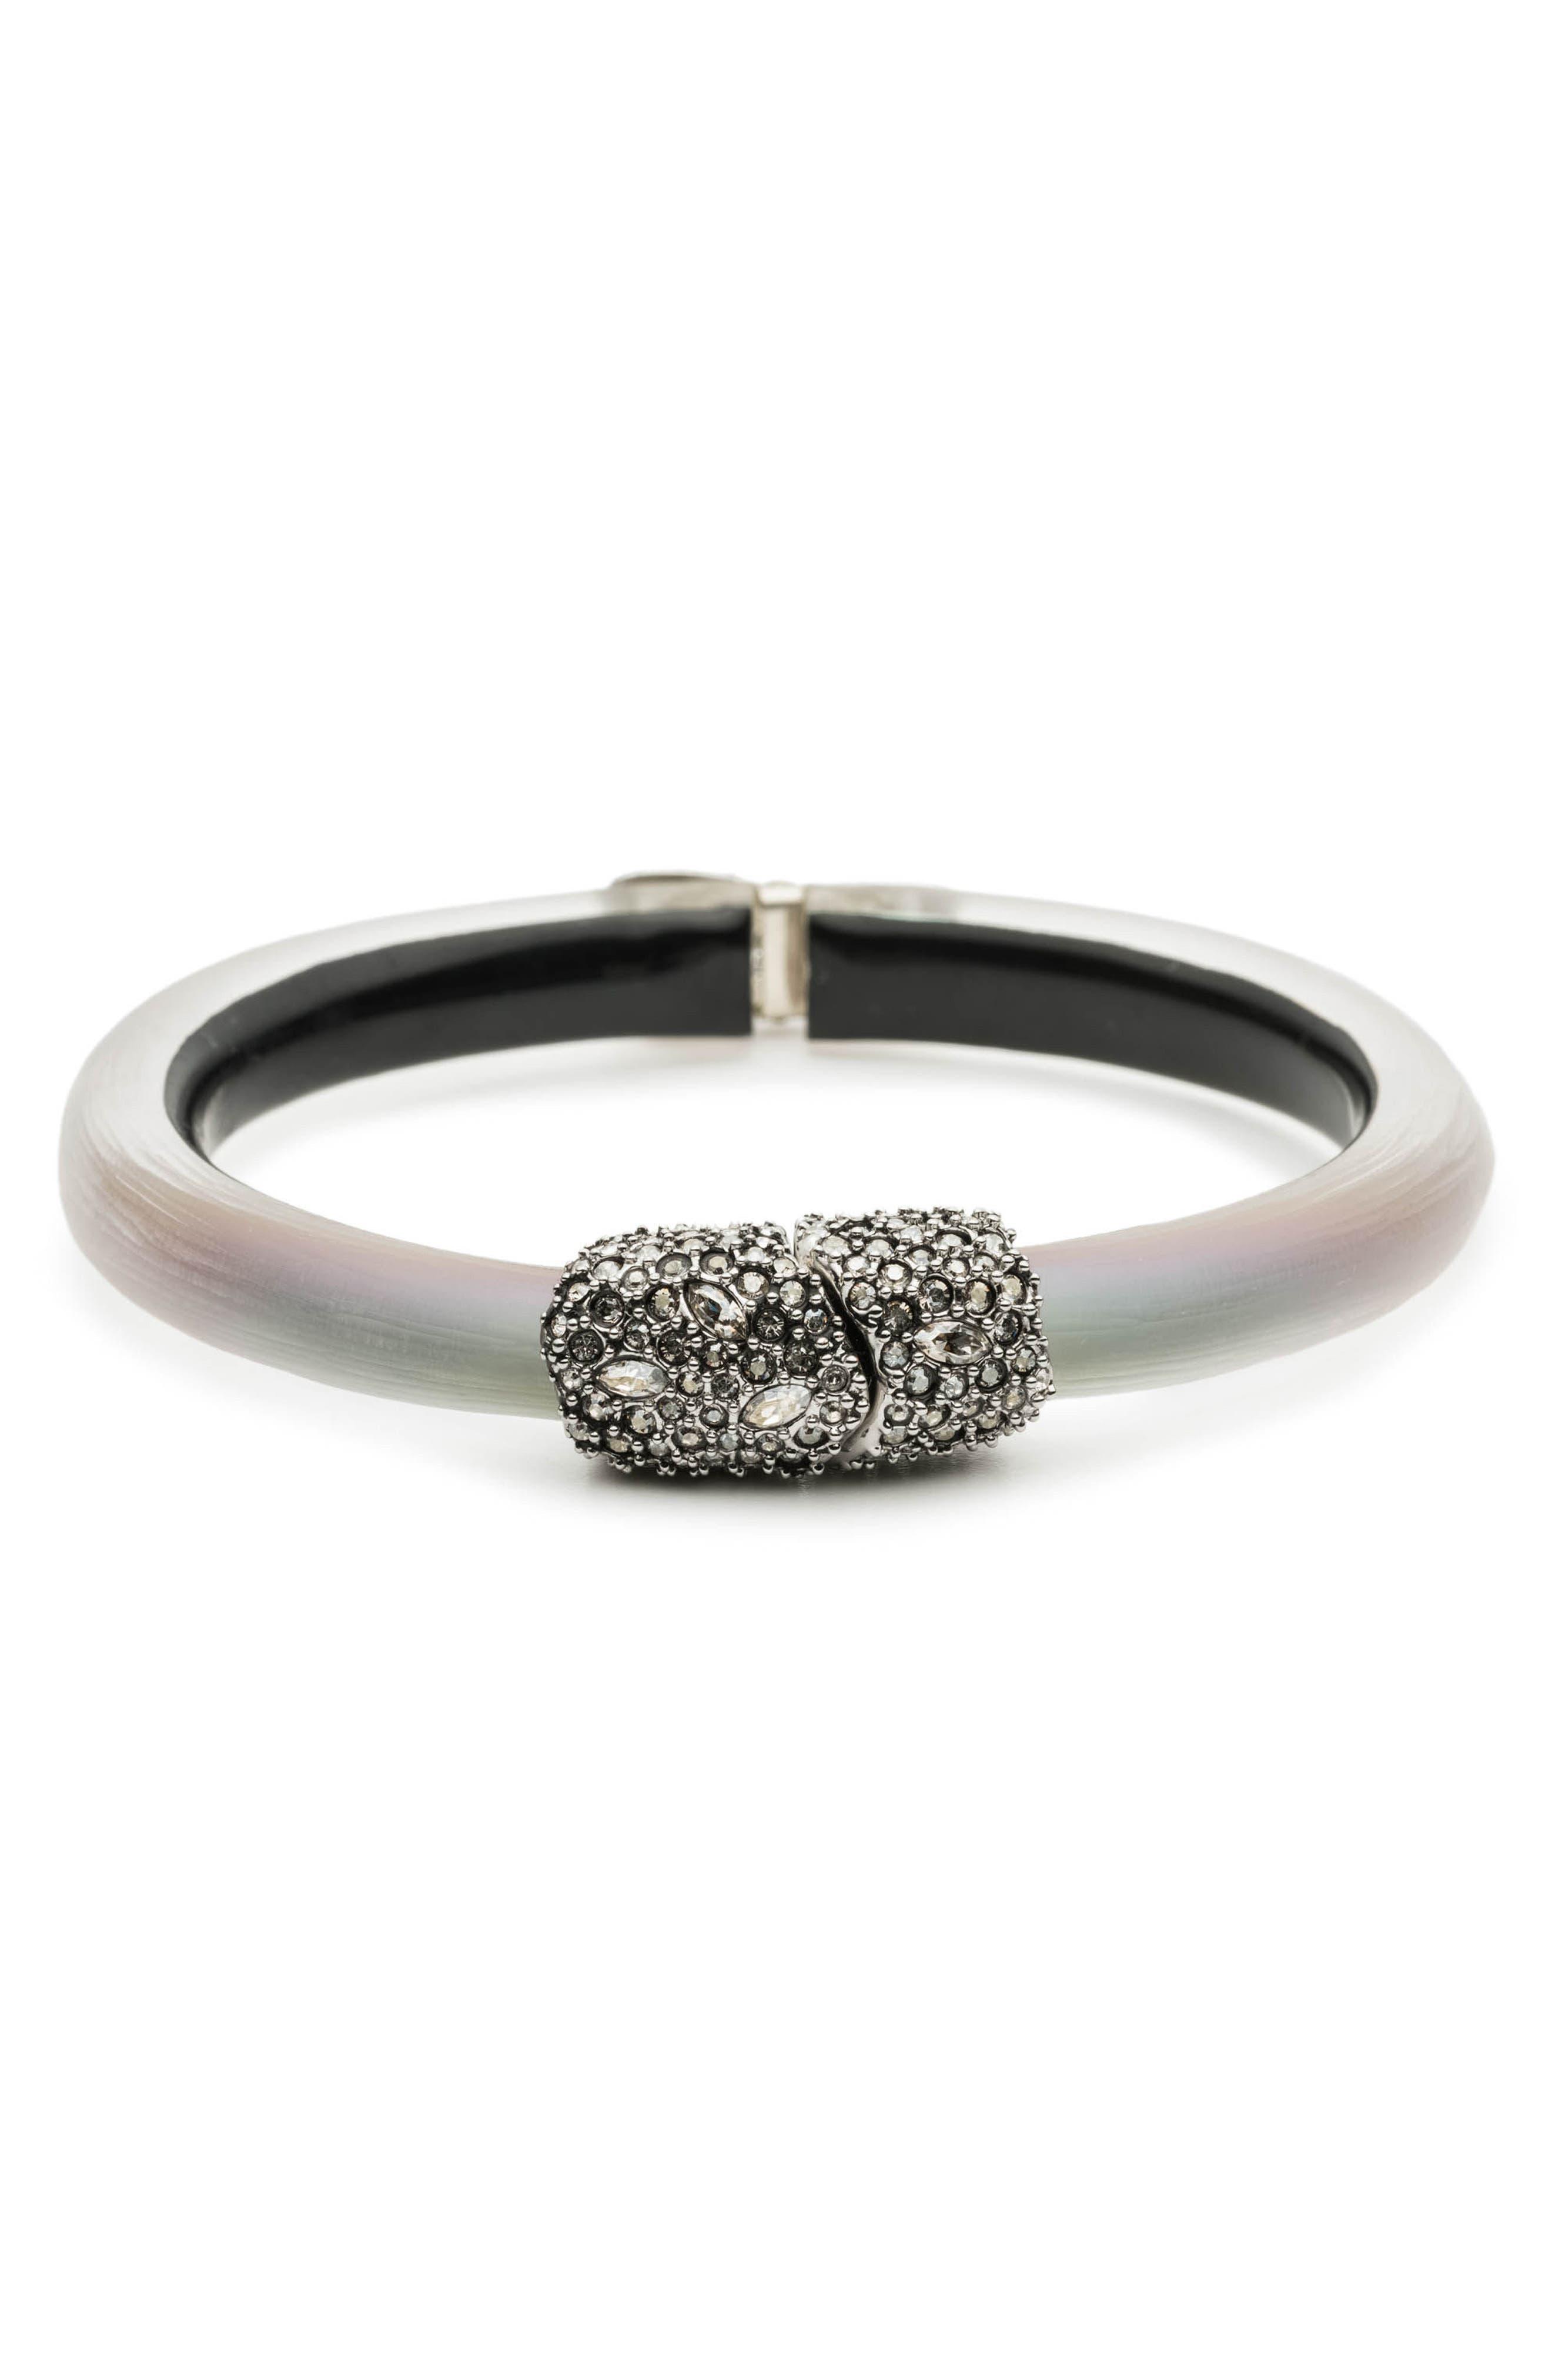 Skinny Hinge Bracelet,                             Main thumbnail 1, color,                             NEW LABRADORITE